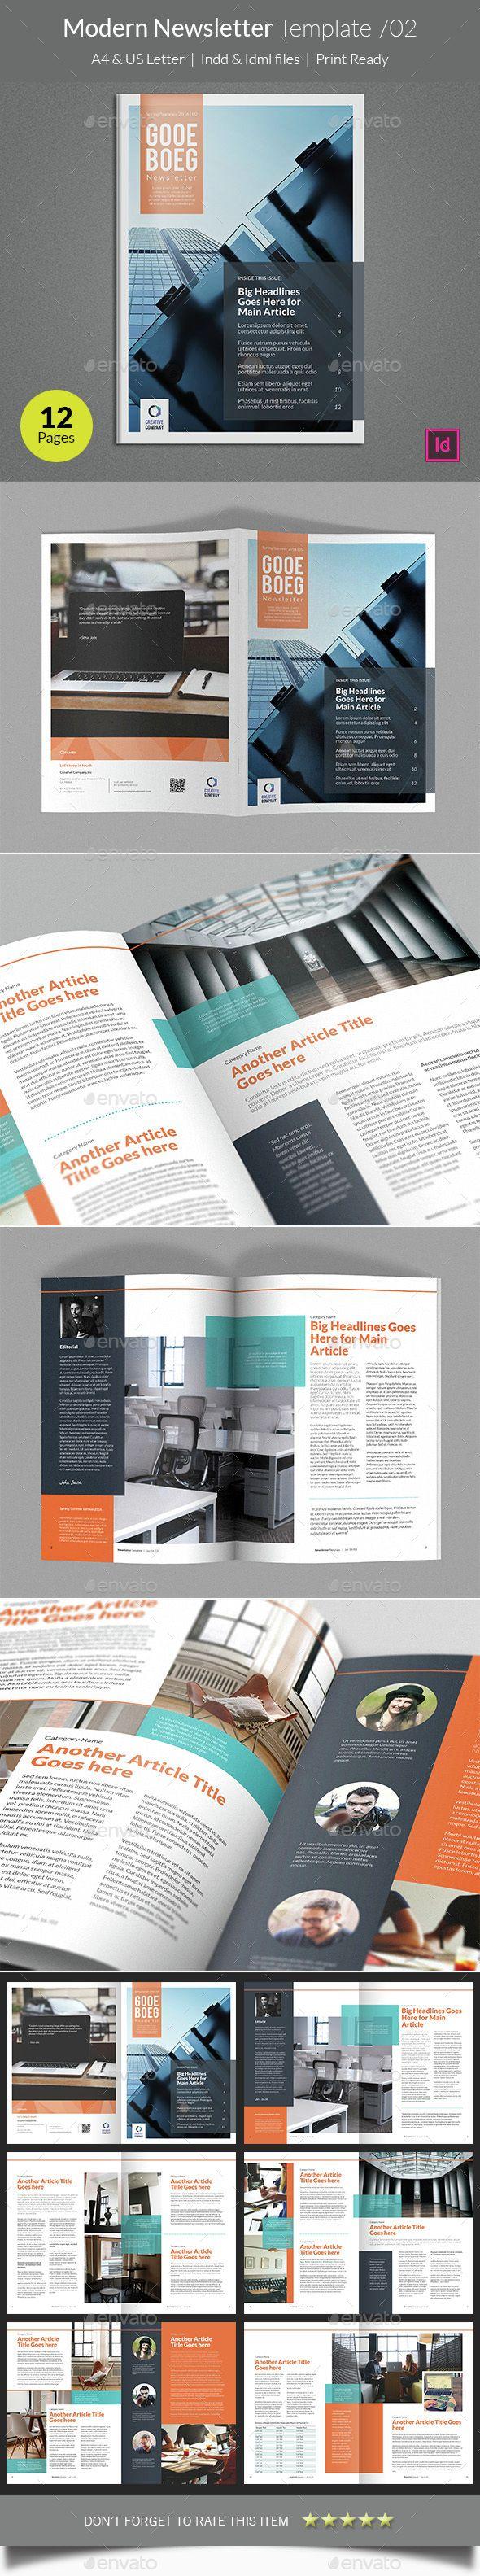 Modern Newsletter Template InDesign INDD. Download here: http://graphicriver.net/item/modern-newsletter-template-v02/14574840?ref=ksioks